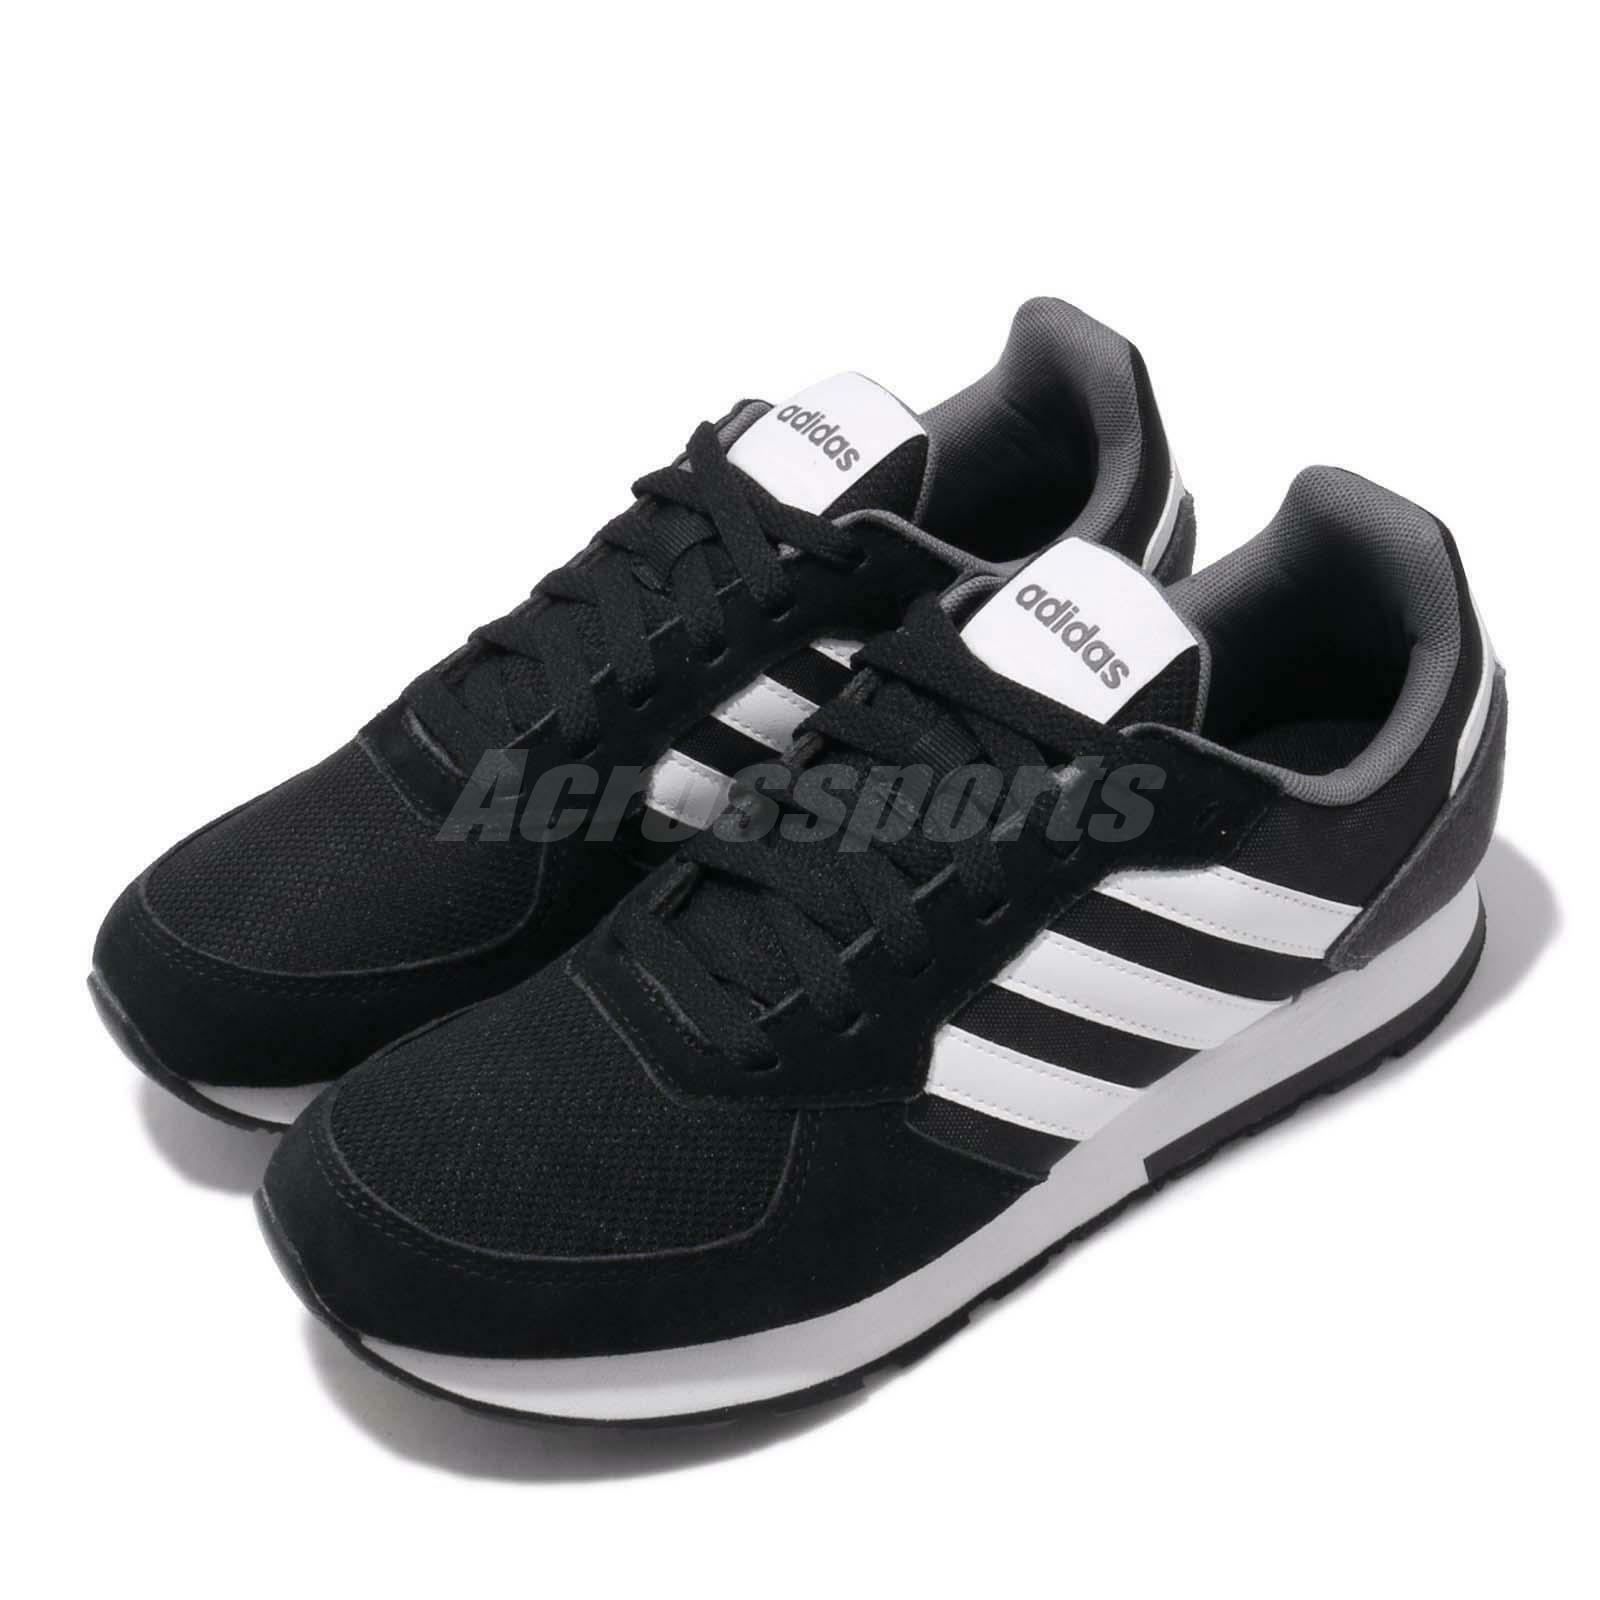 Adidas 8K Black White Grey Men Running Casual Lifestyle shoes Sneakers B44650